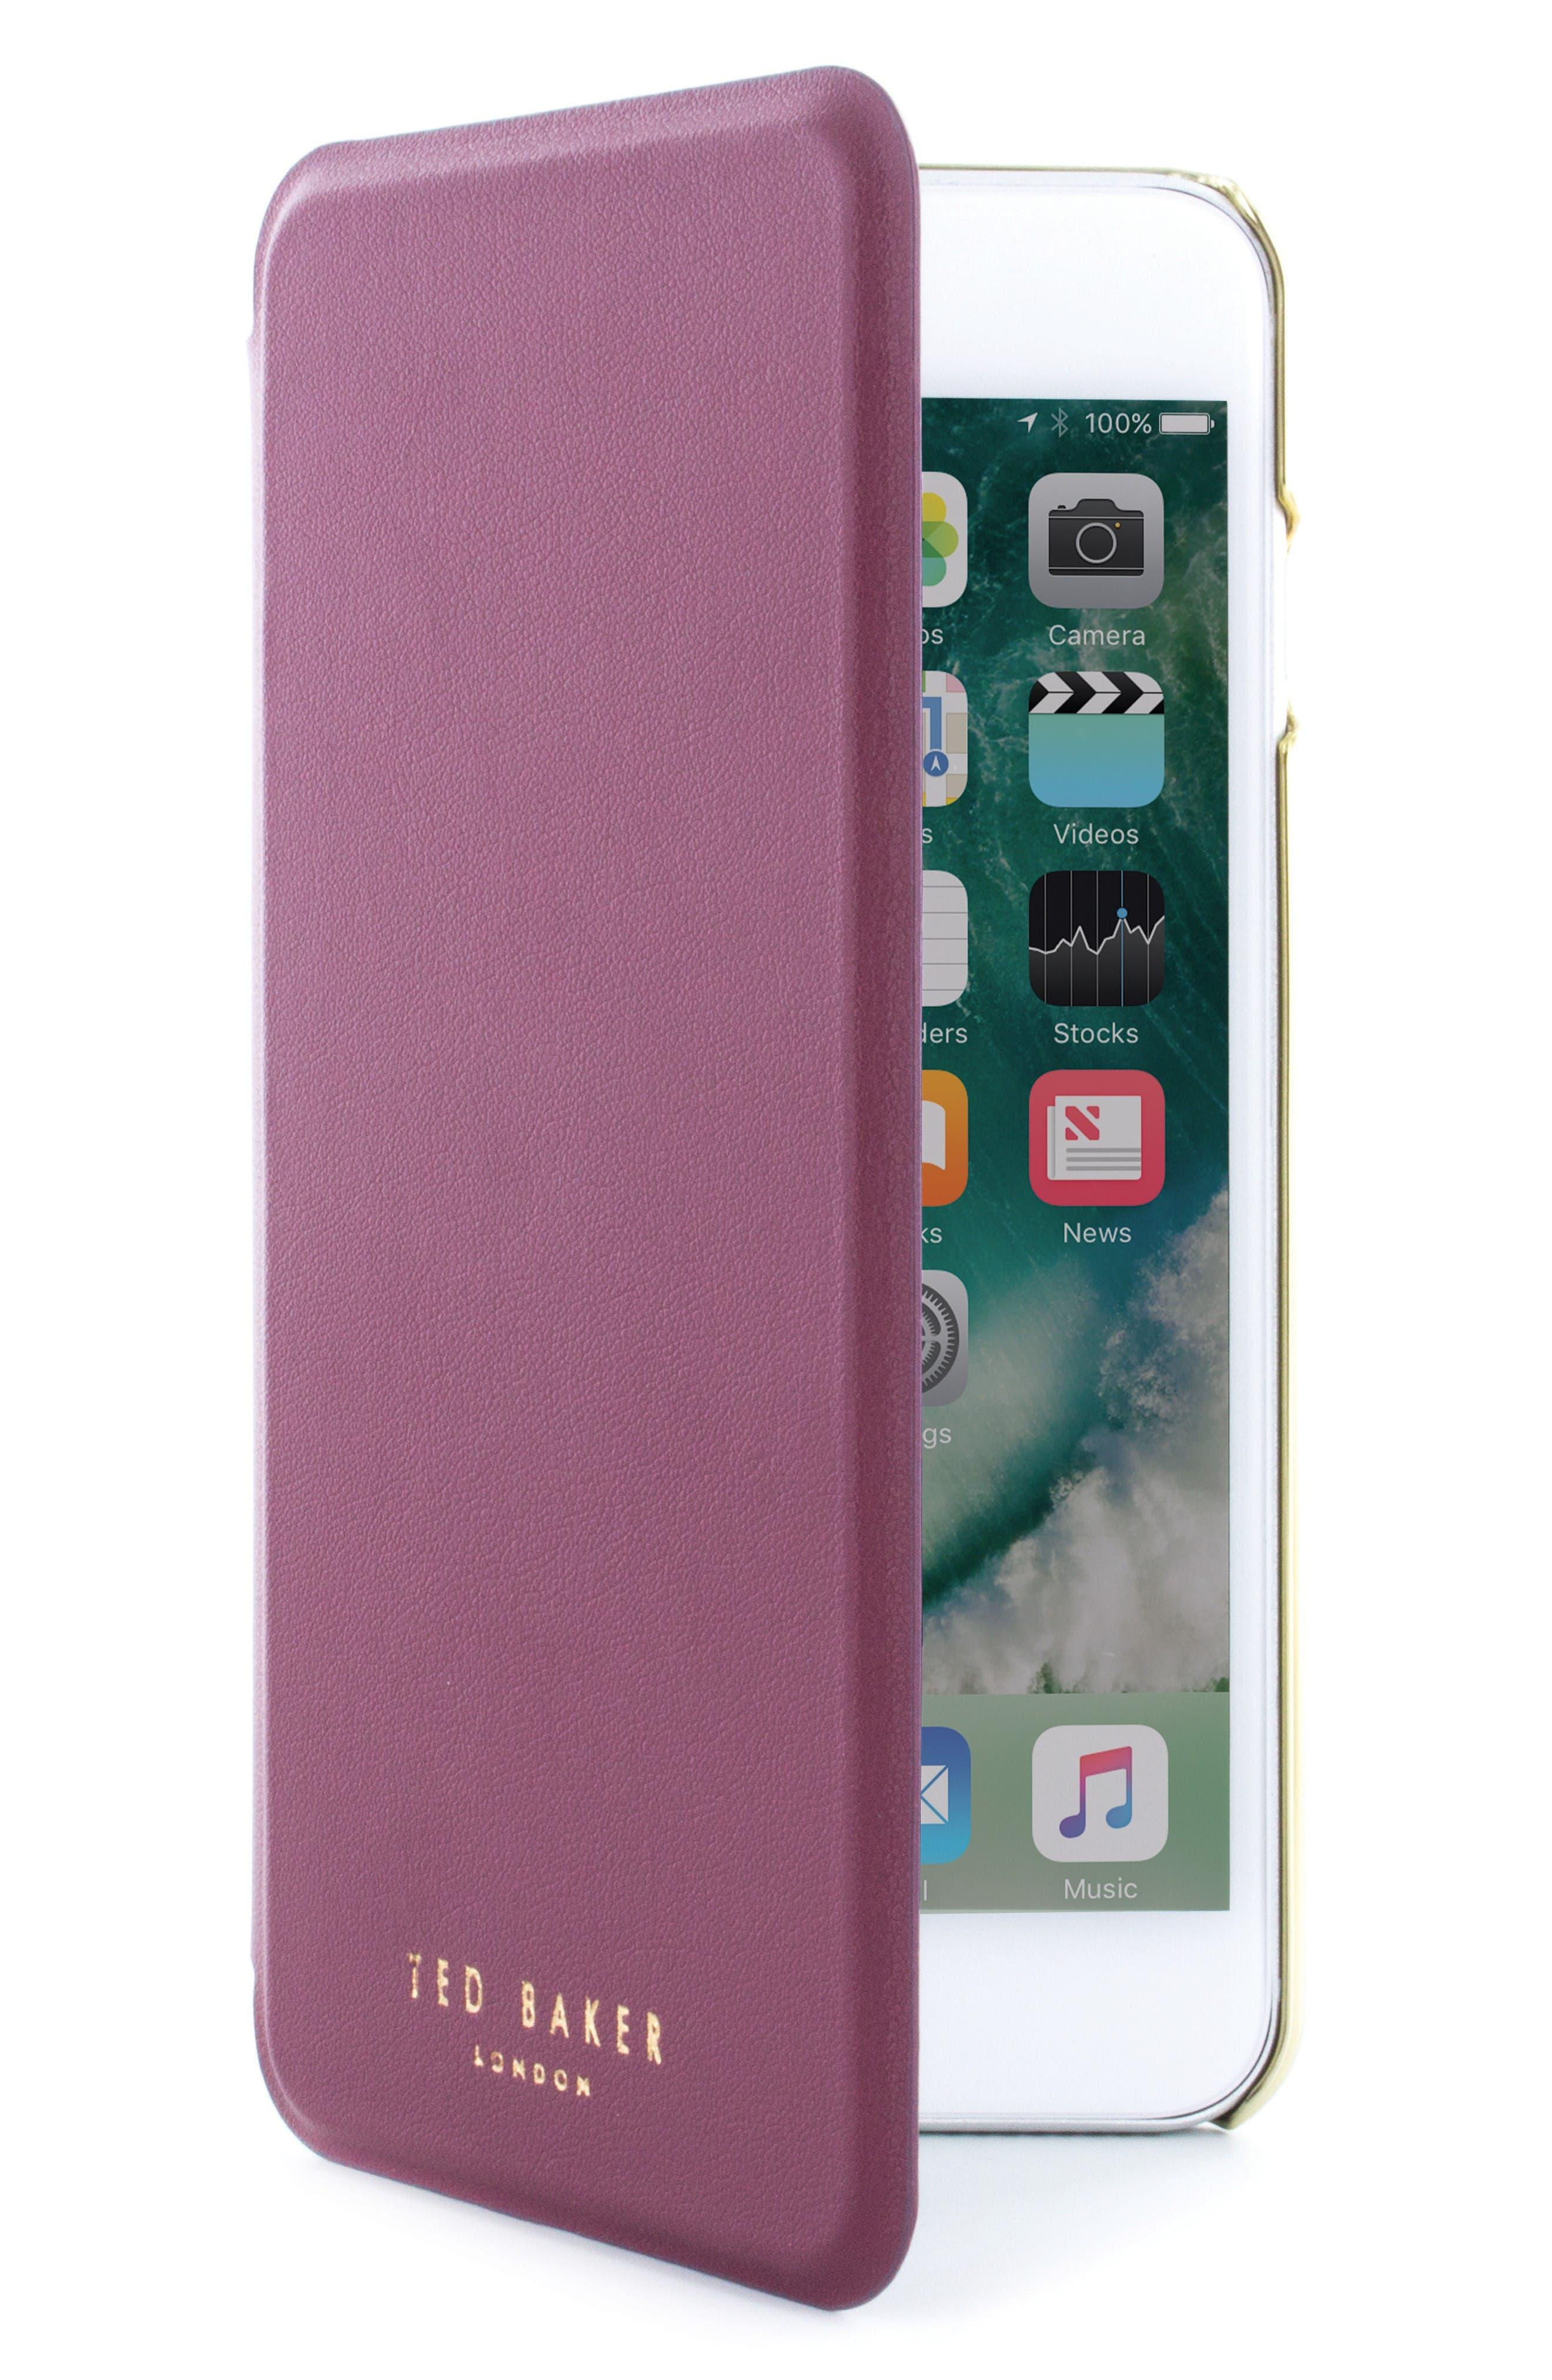 Ted Baker London Shannon iPhone 6/6s/7/8 Plus Mirror Folio Case